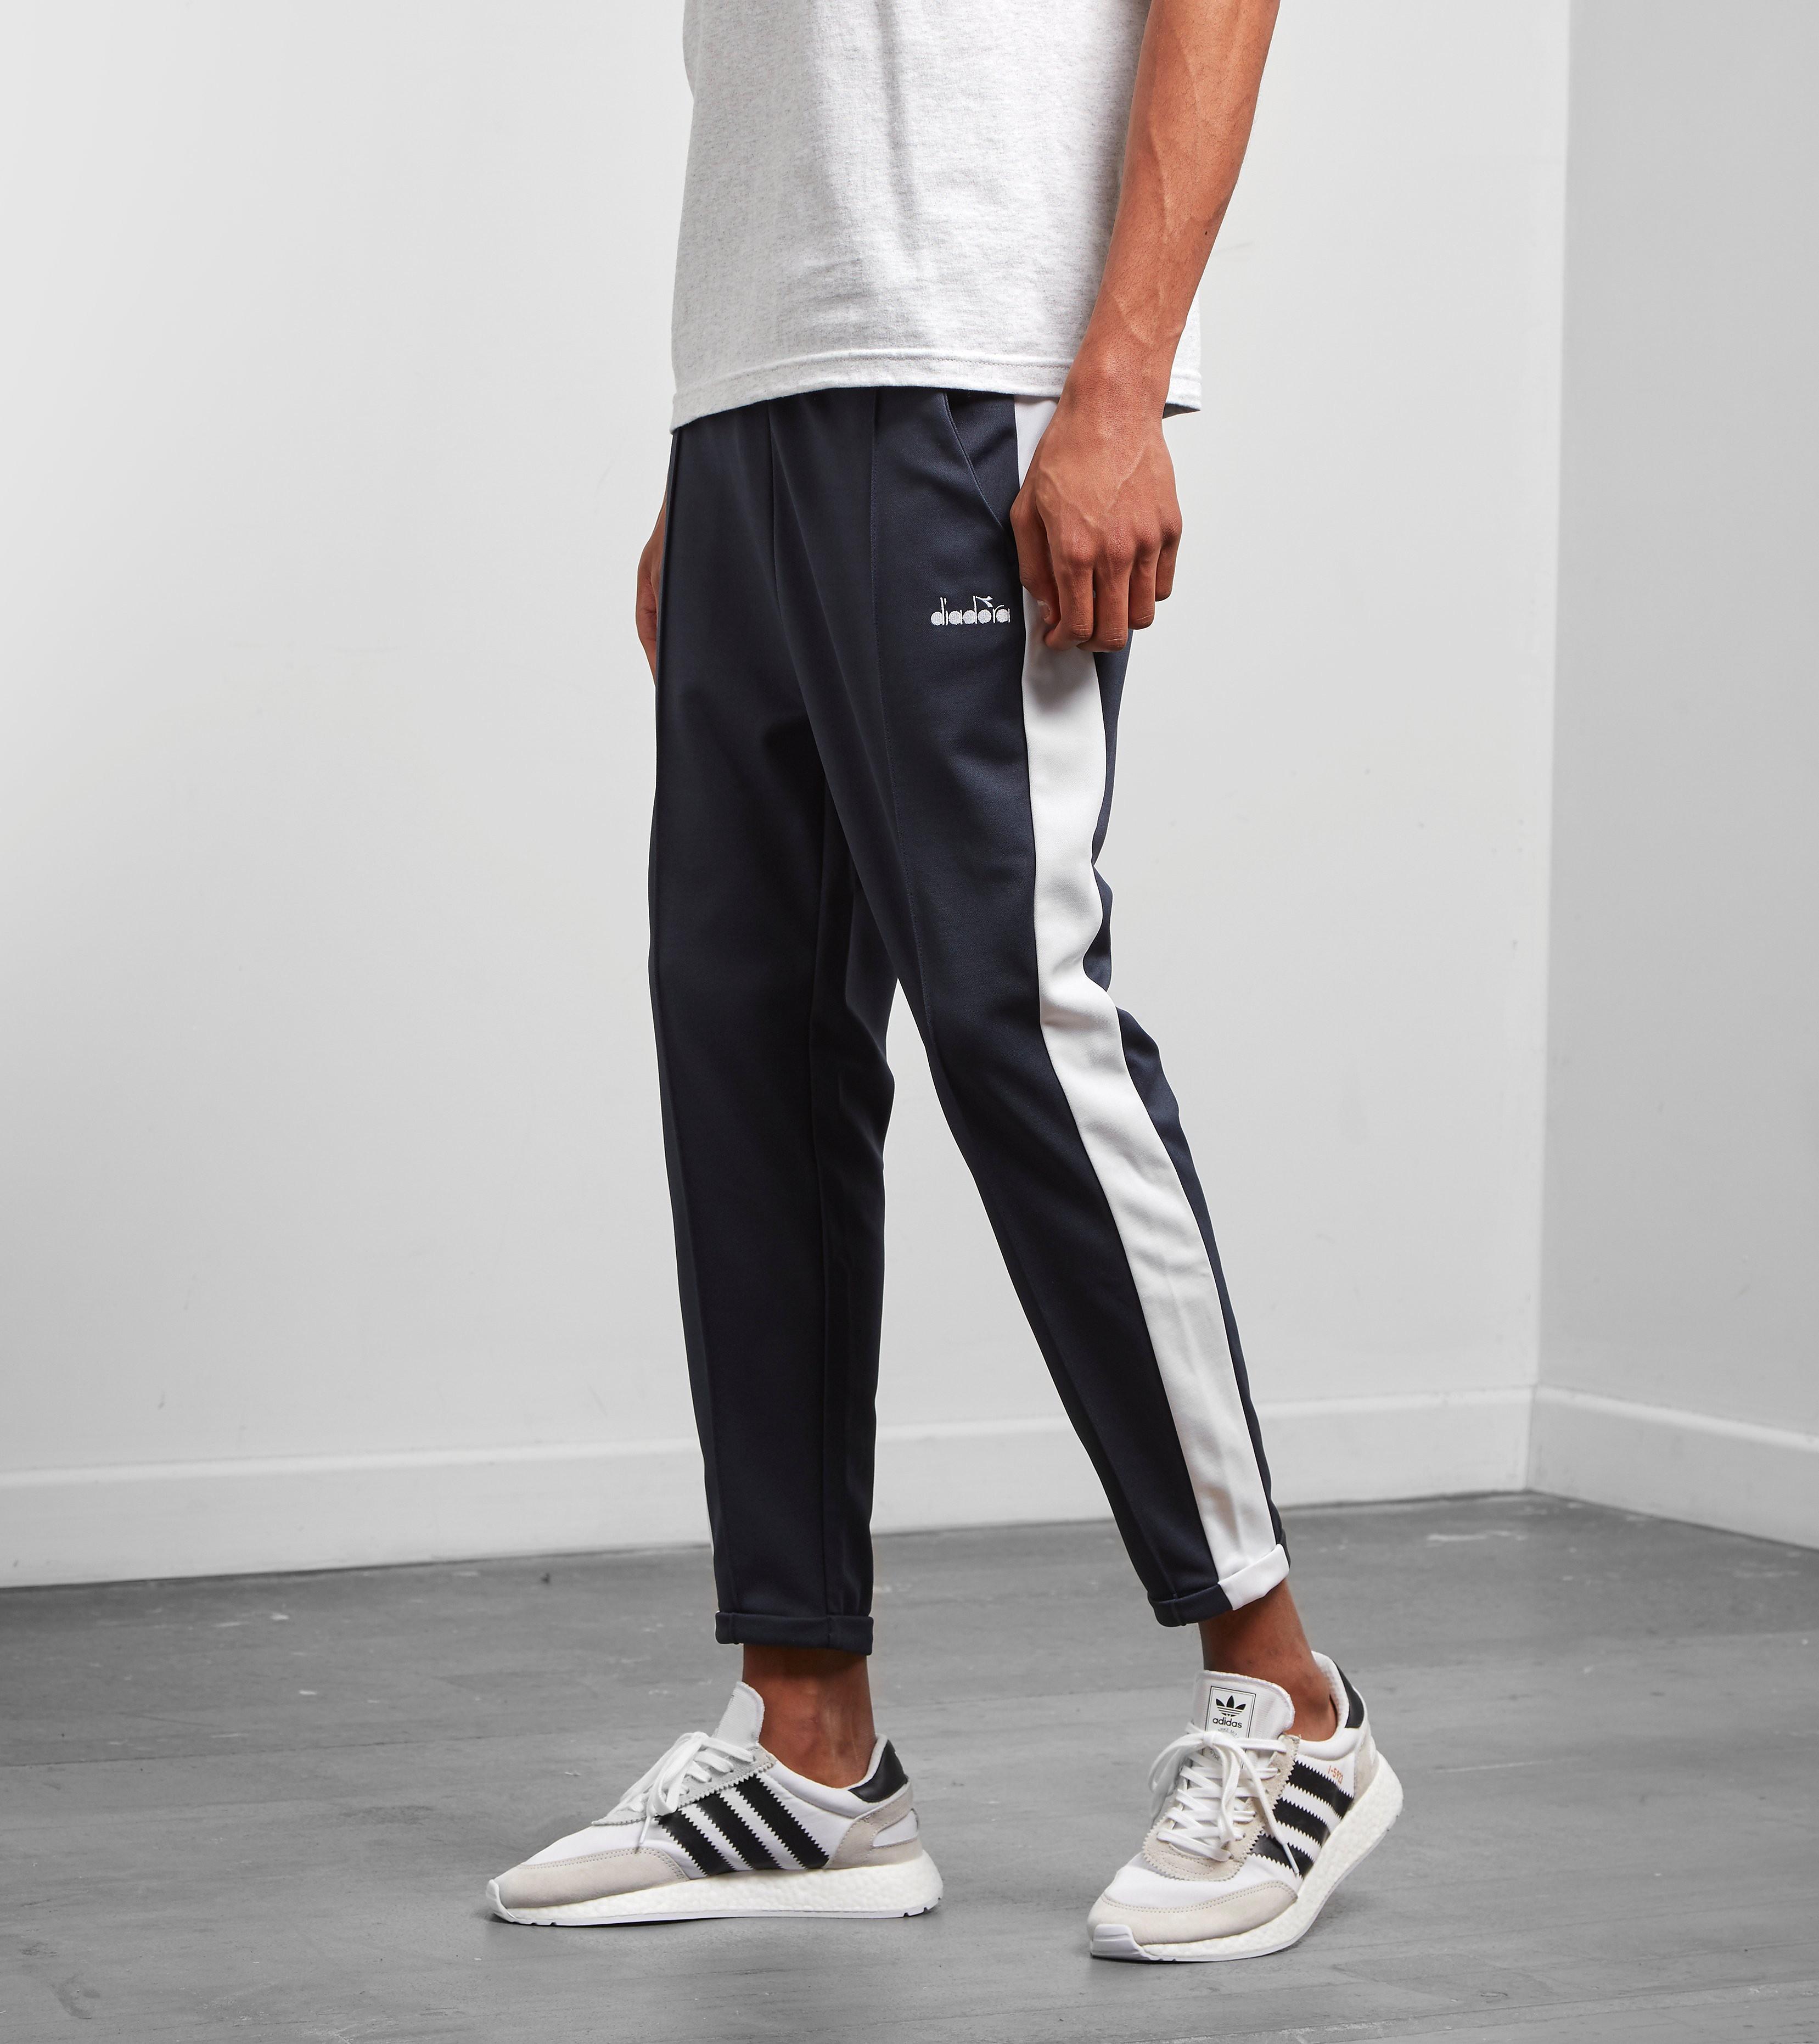 Diadora 80's Track Pants